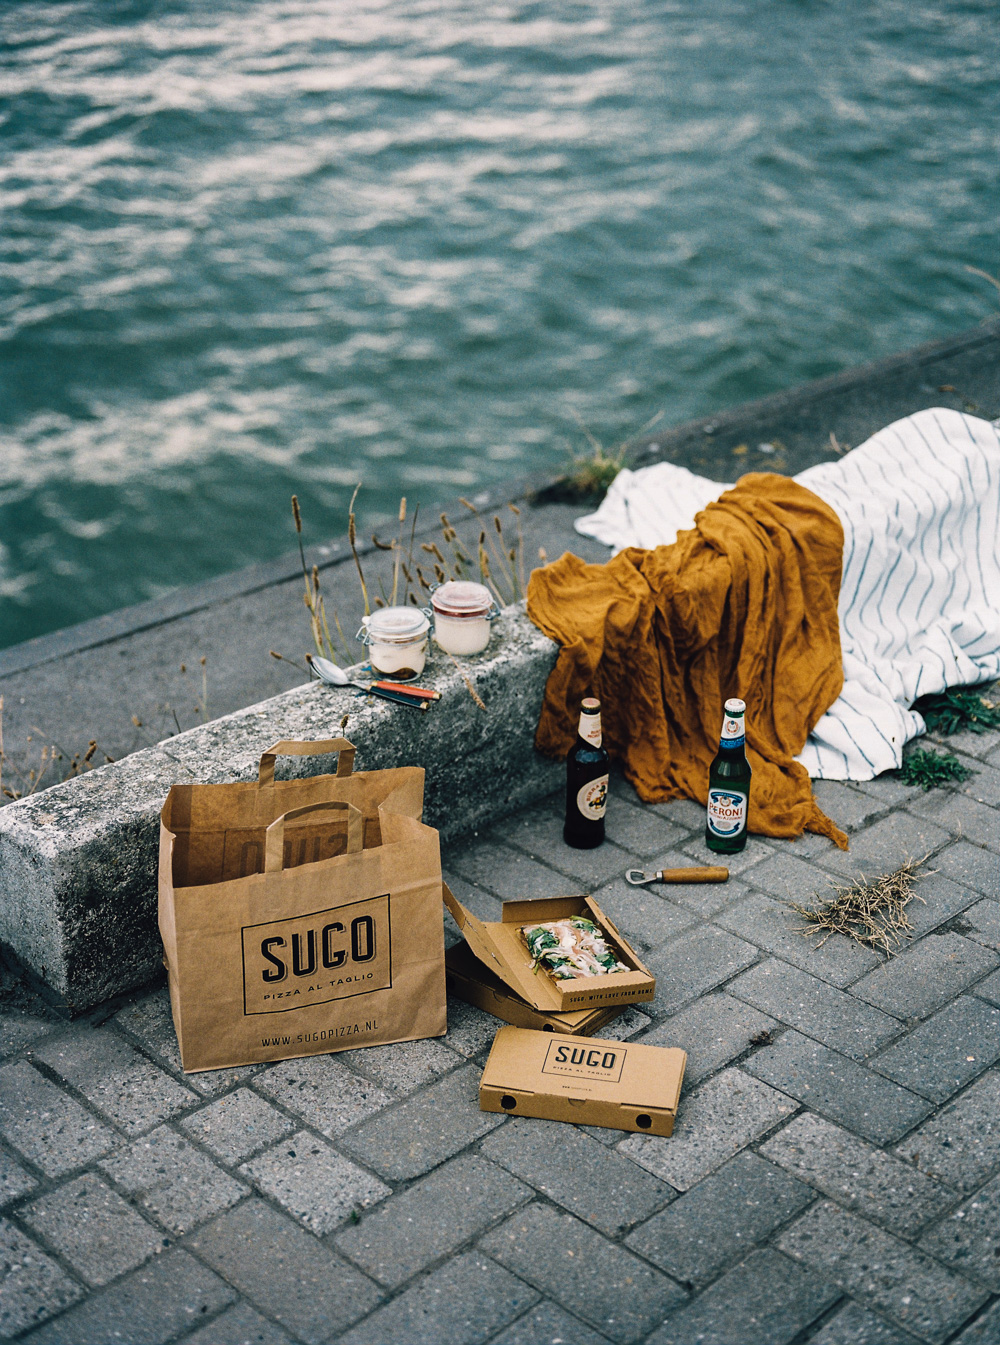 hanke-arkenbout-inspire-styling-sugo-pizza-16.jpg